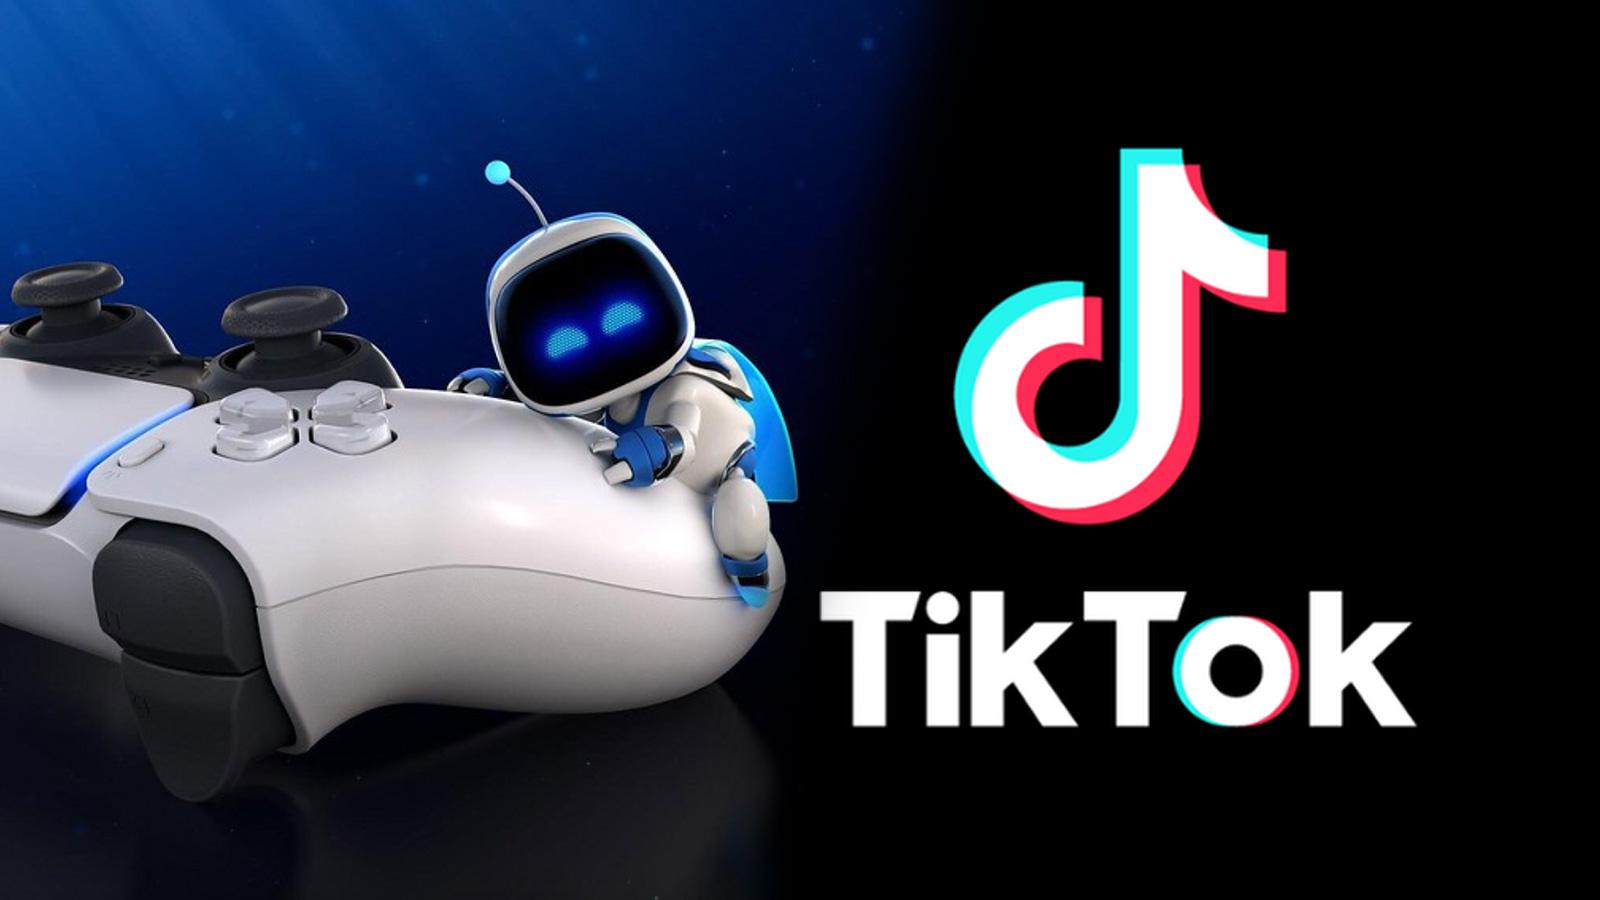 PlayStation 5 Dual Sense controller with TikTok logo.